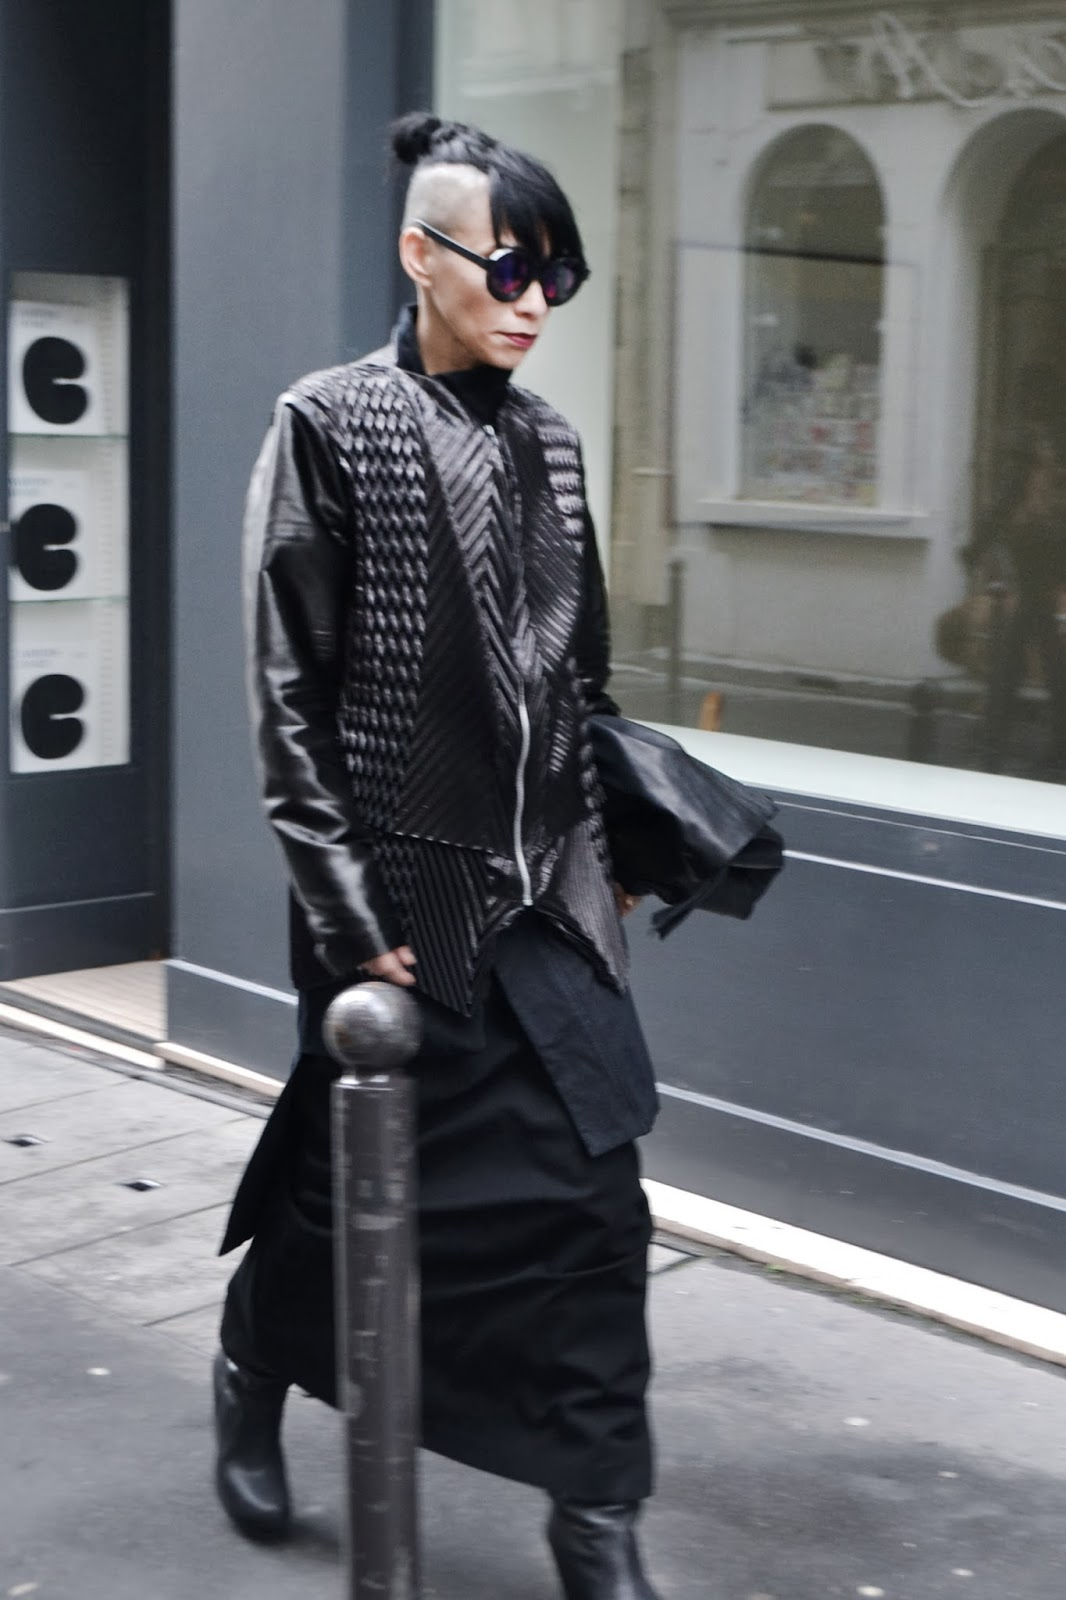 jorge-ayala-paris-lily-gatins-fashion (2).JPG